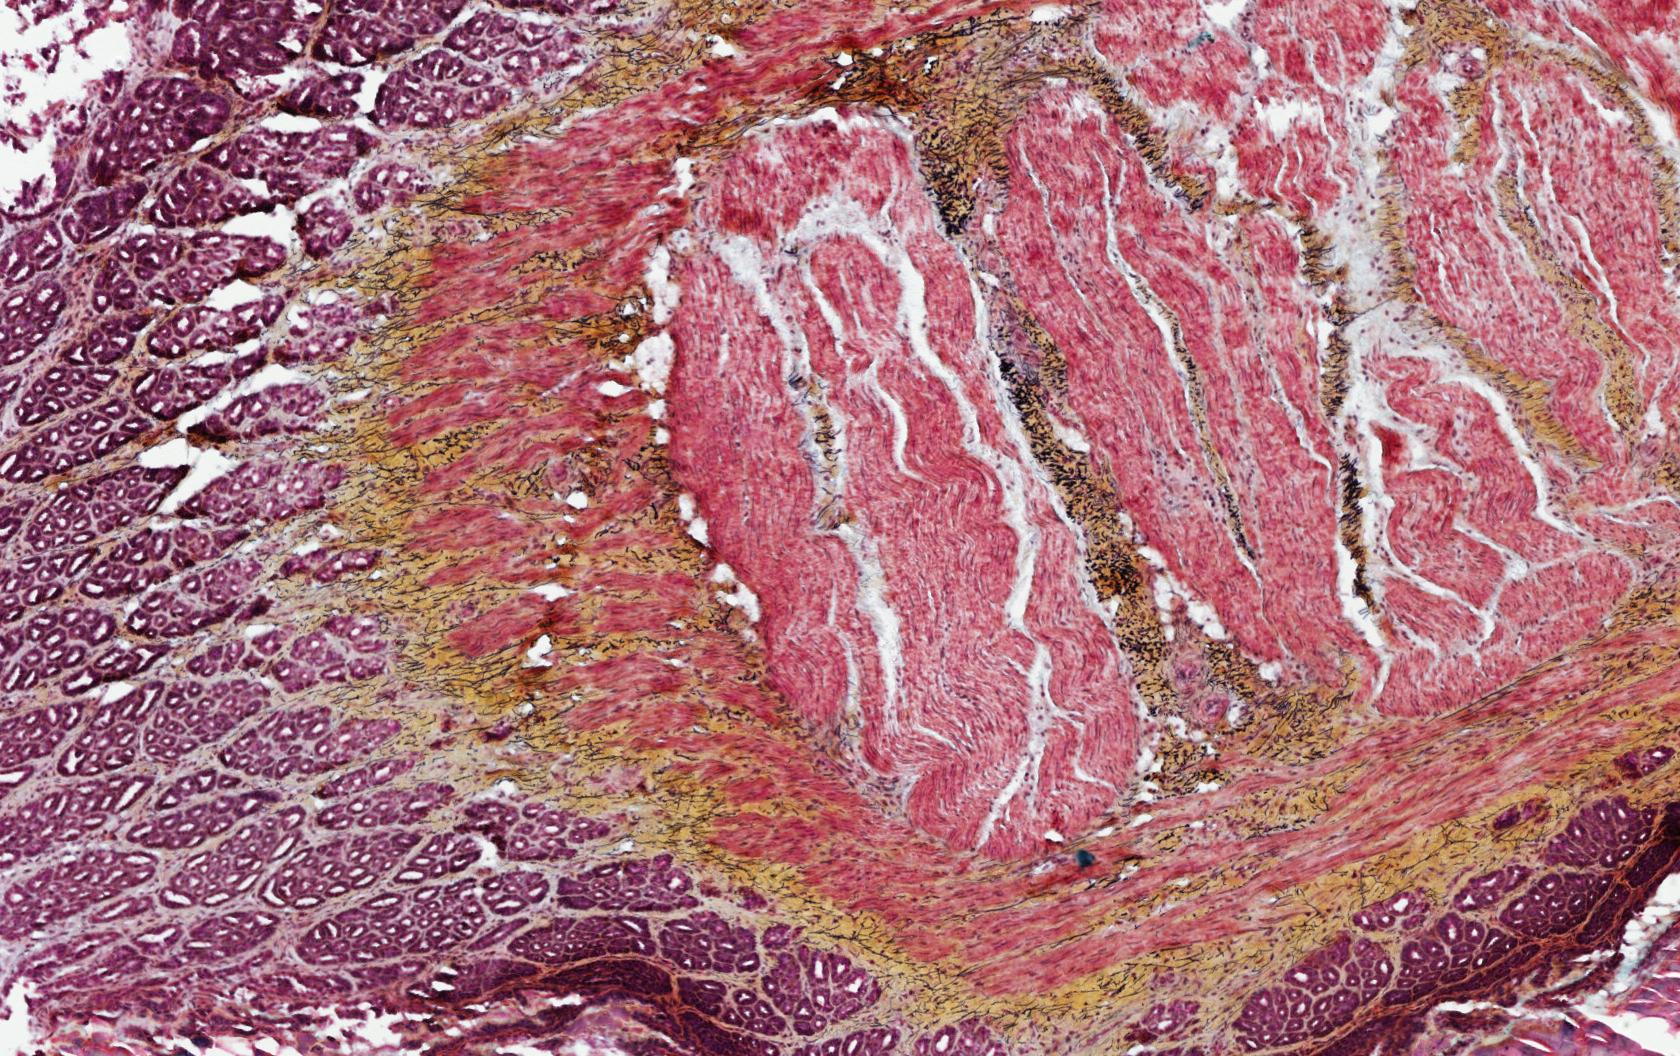 ALTHISIA movat pentachrome 5